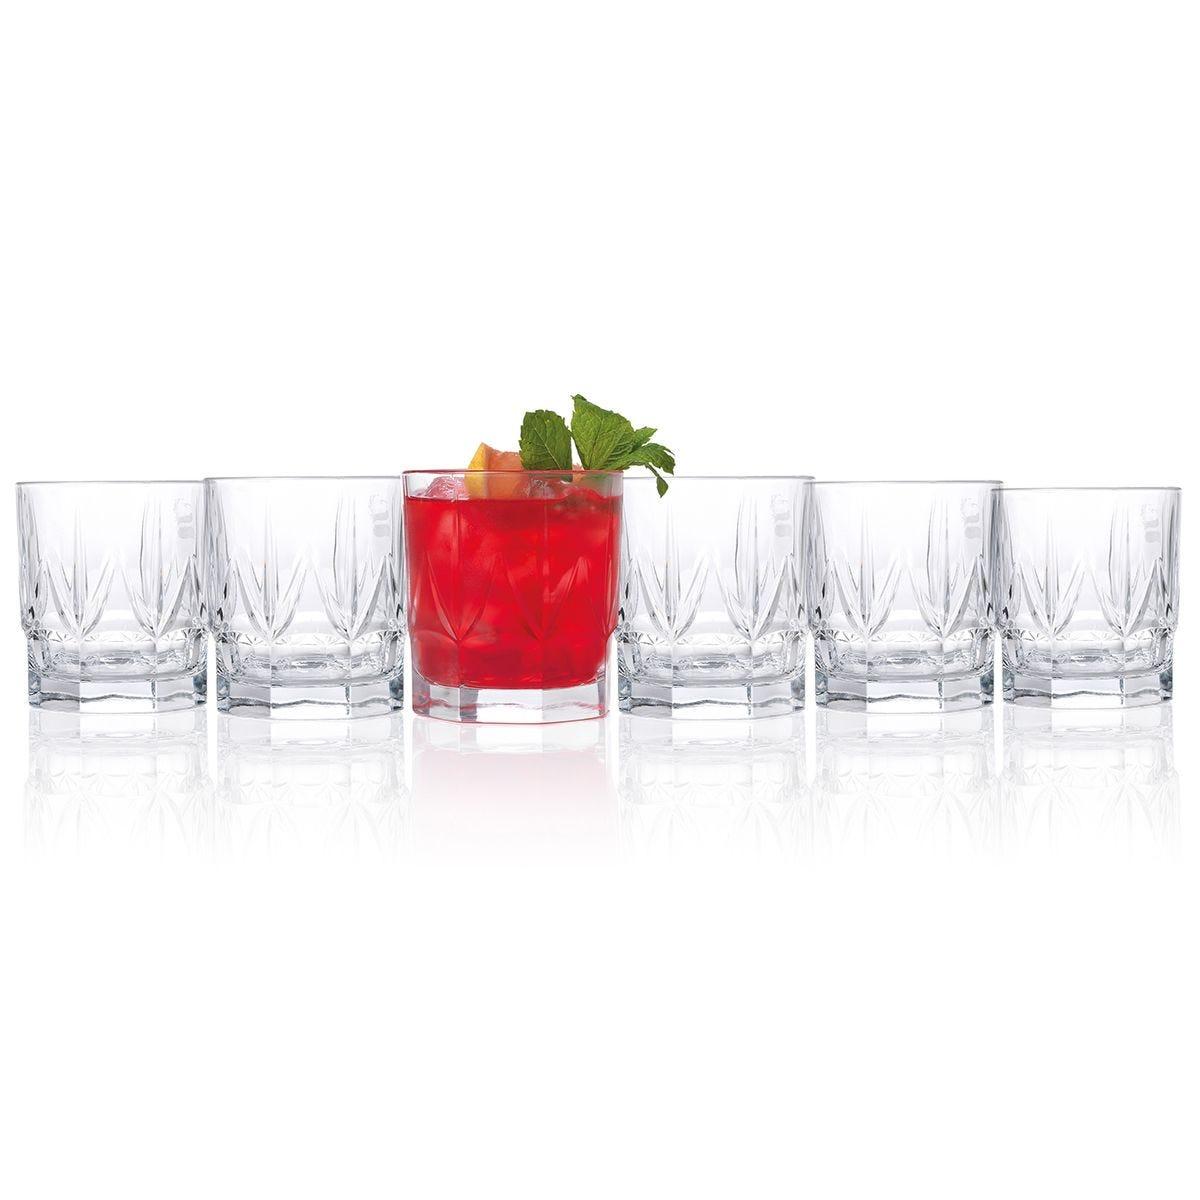 RCR Chic Luxury Whiskey Glasses - Set of 6